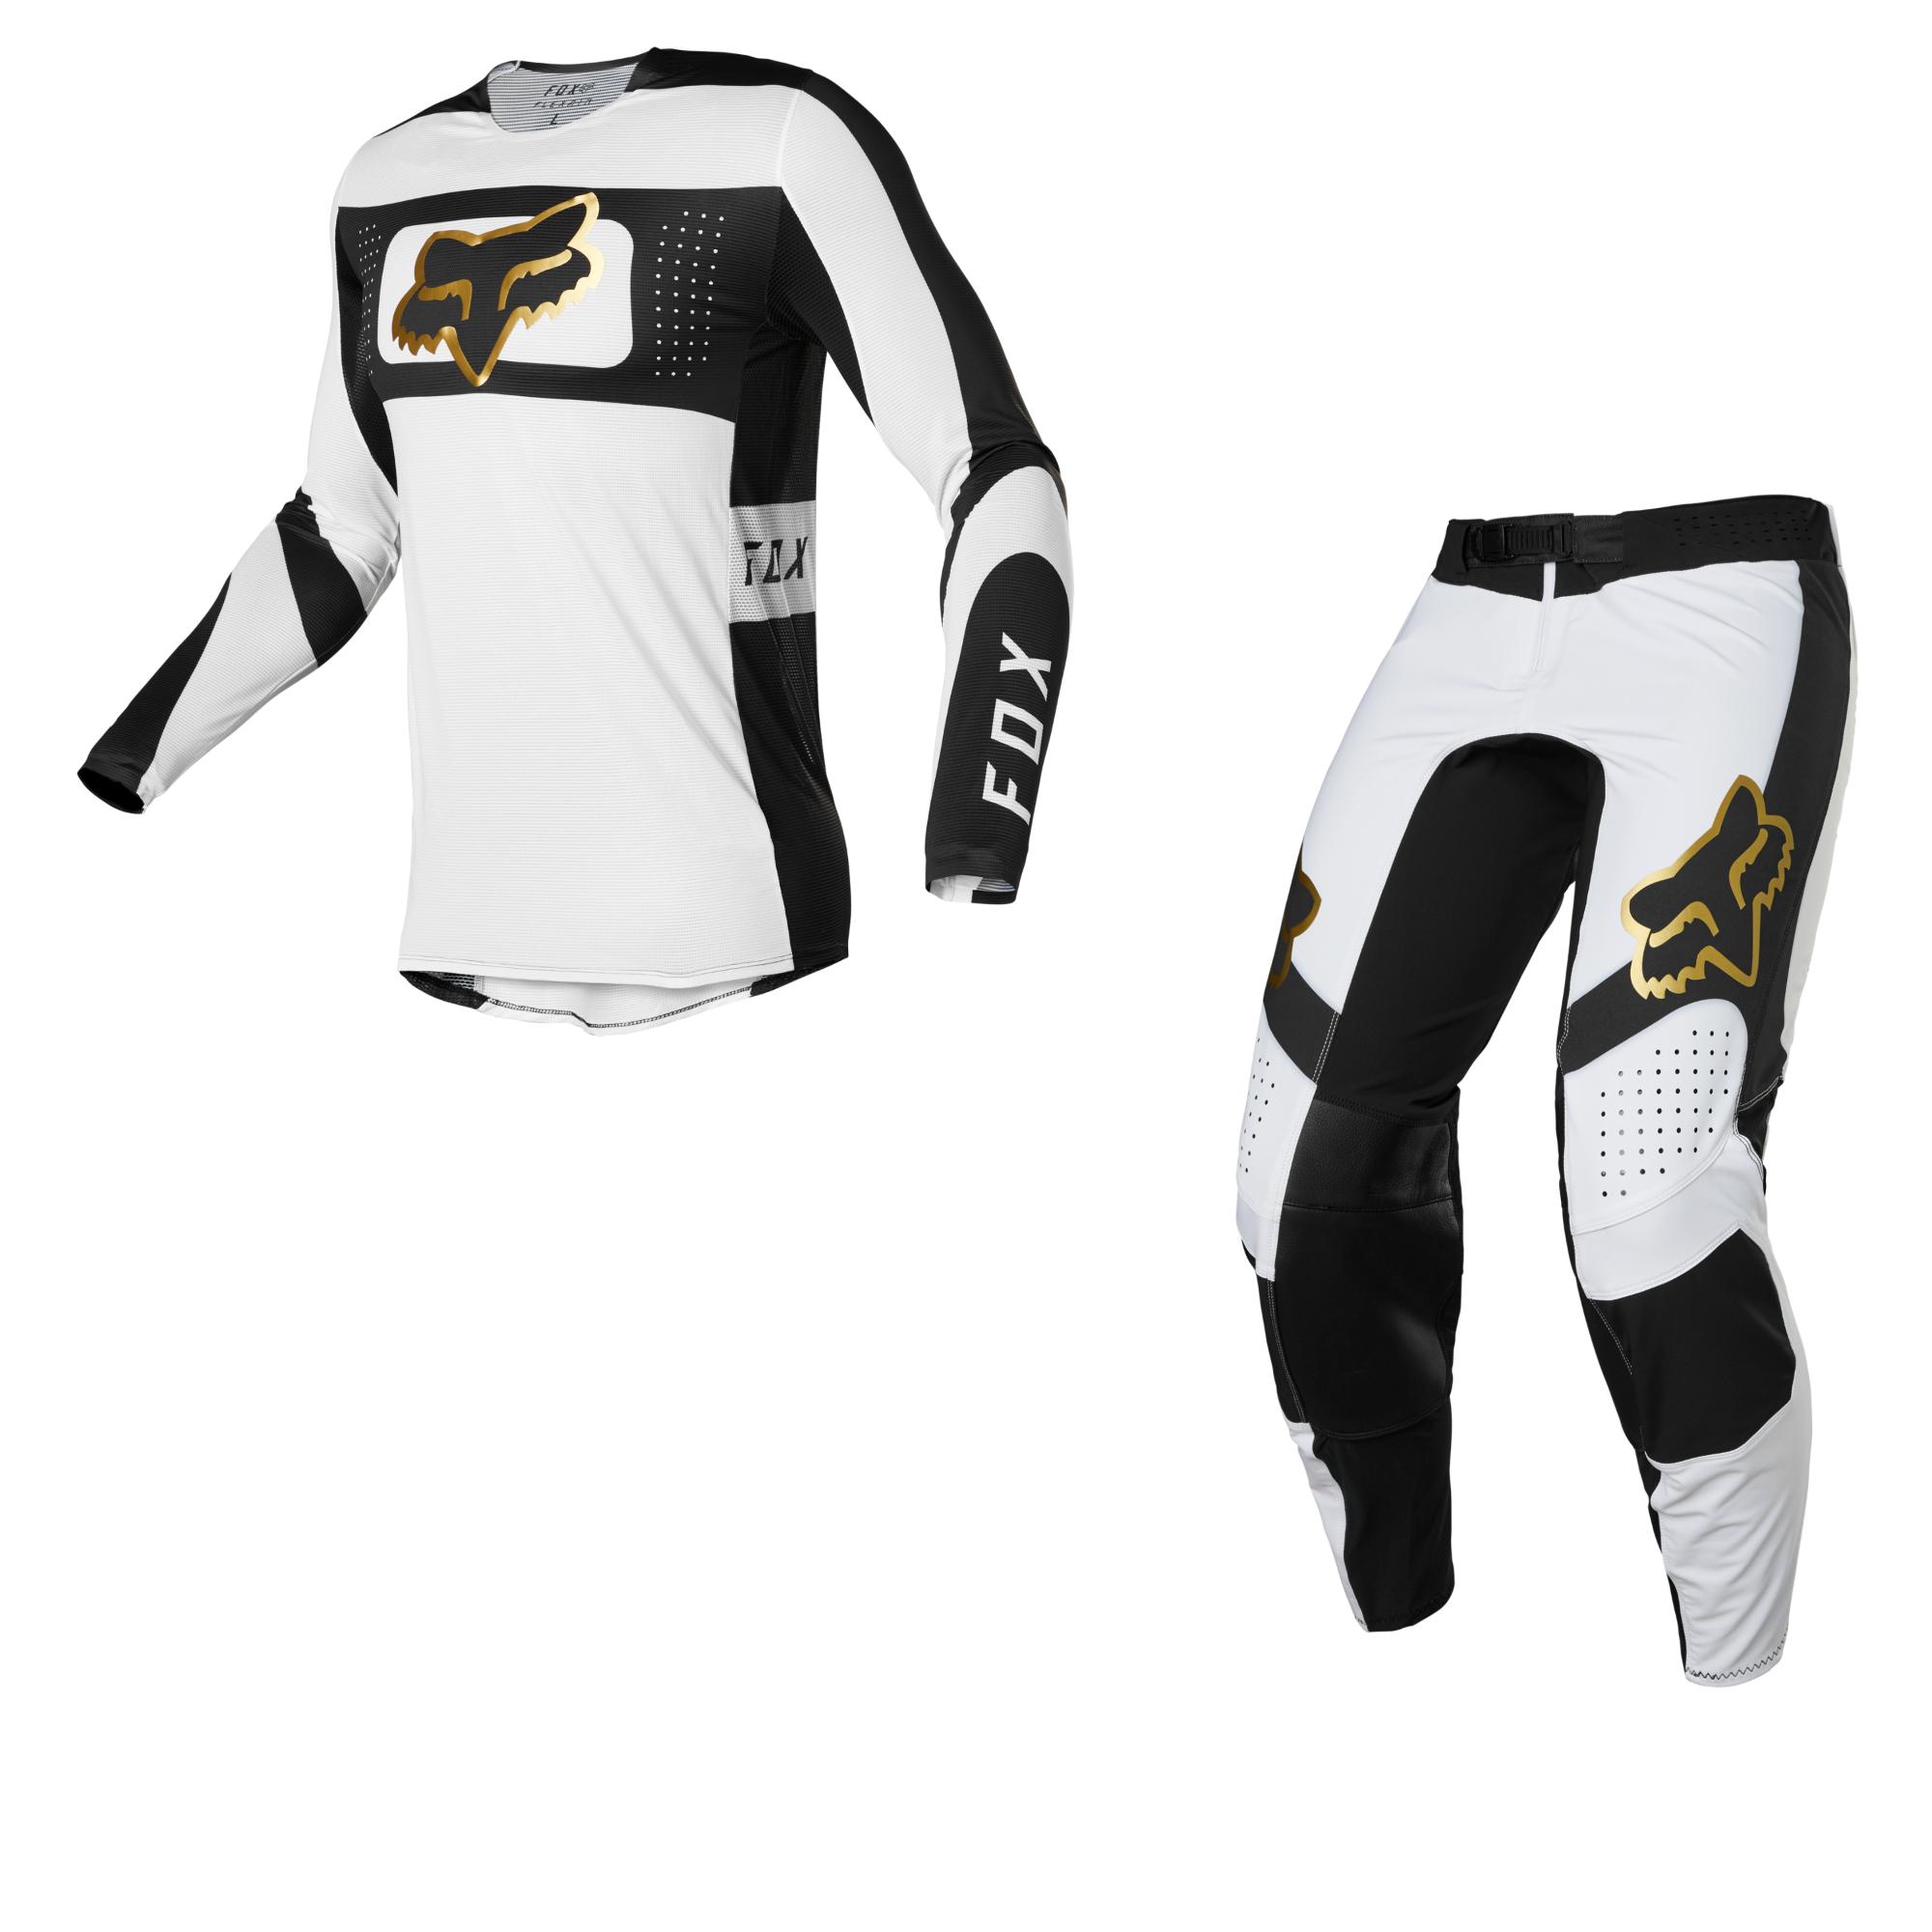 Completo cross enduro Fox FLEXAIR MIRER white black 2022 pantaloni+maglia 1